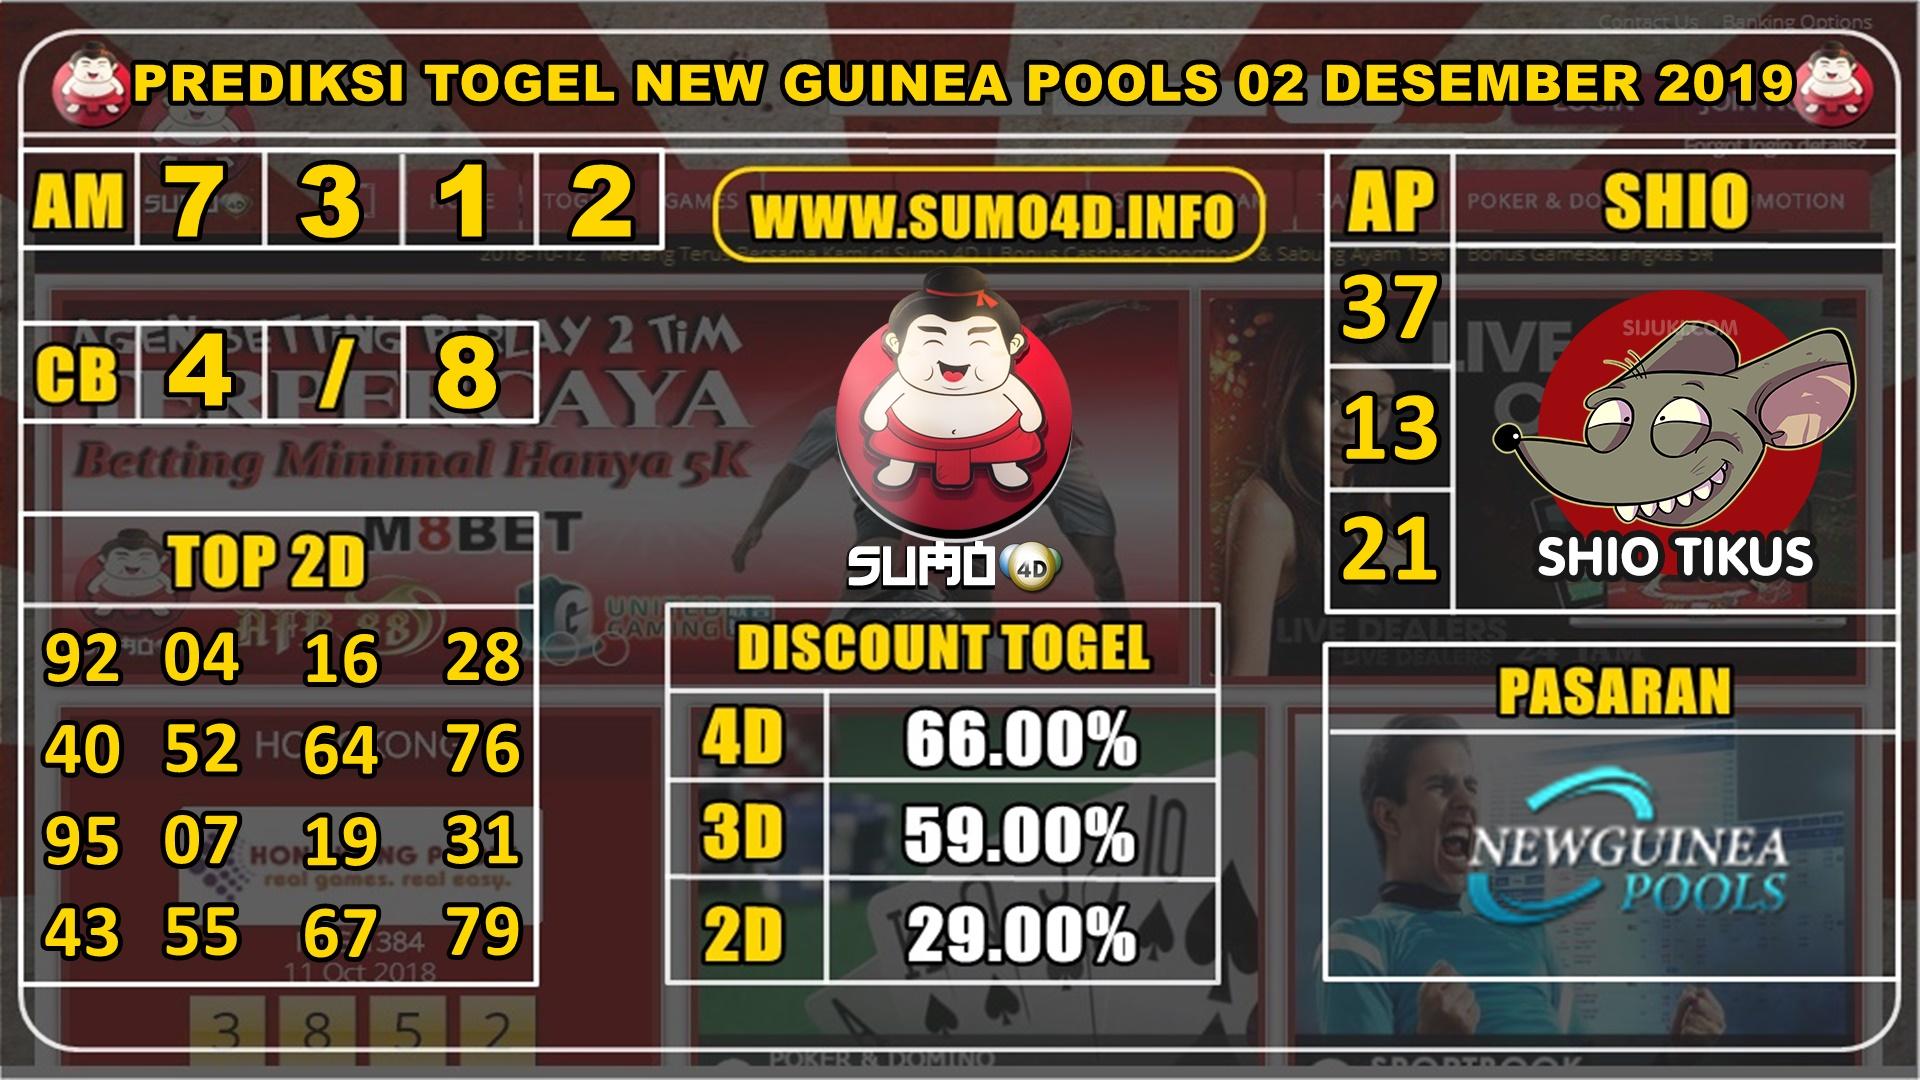 PREDIKSI TOGEL NEW GUINEA POOLS 02 DESEMBER 2019